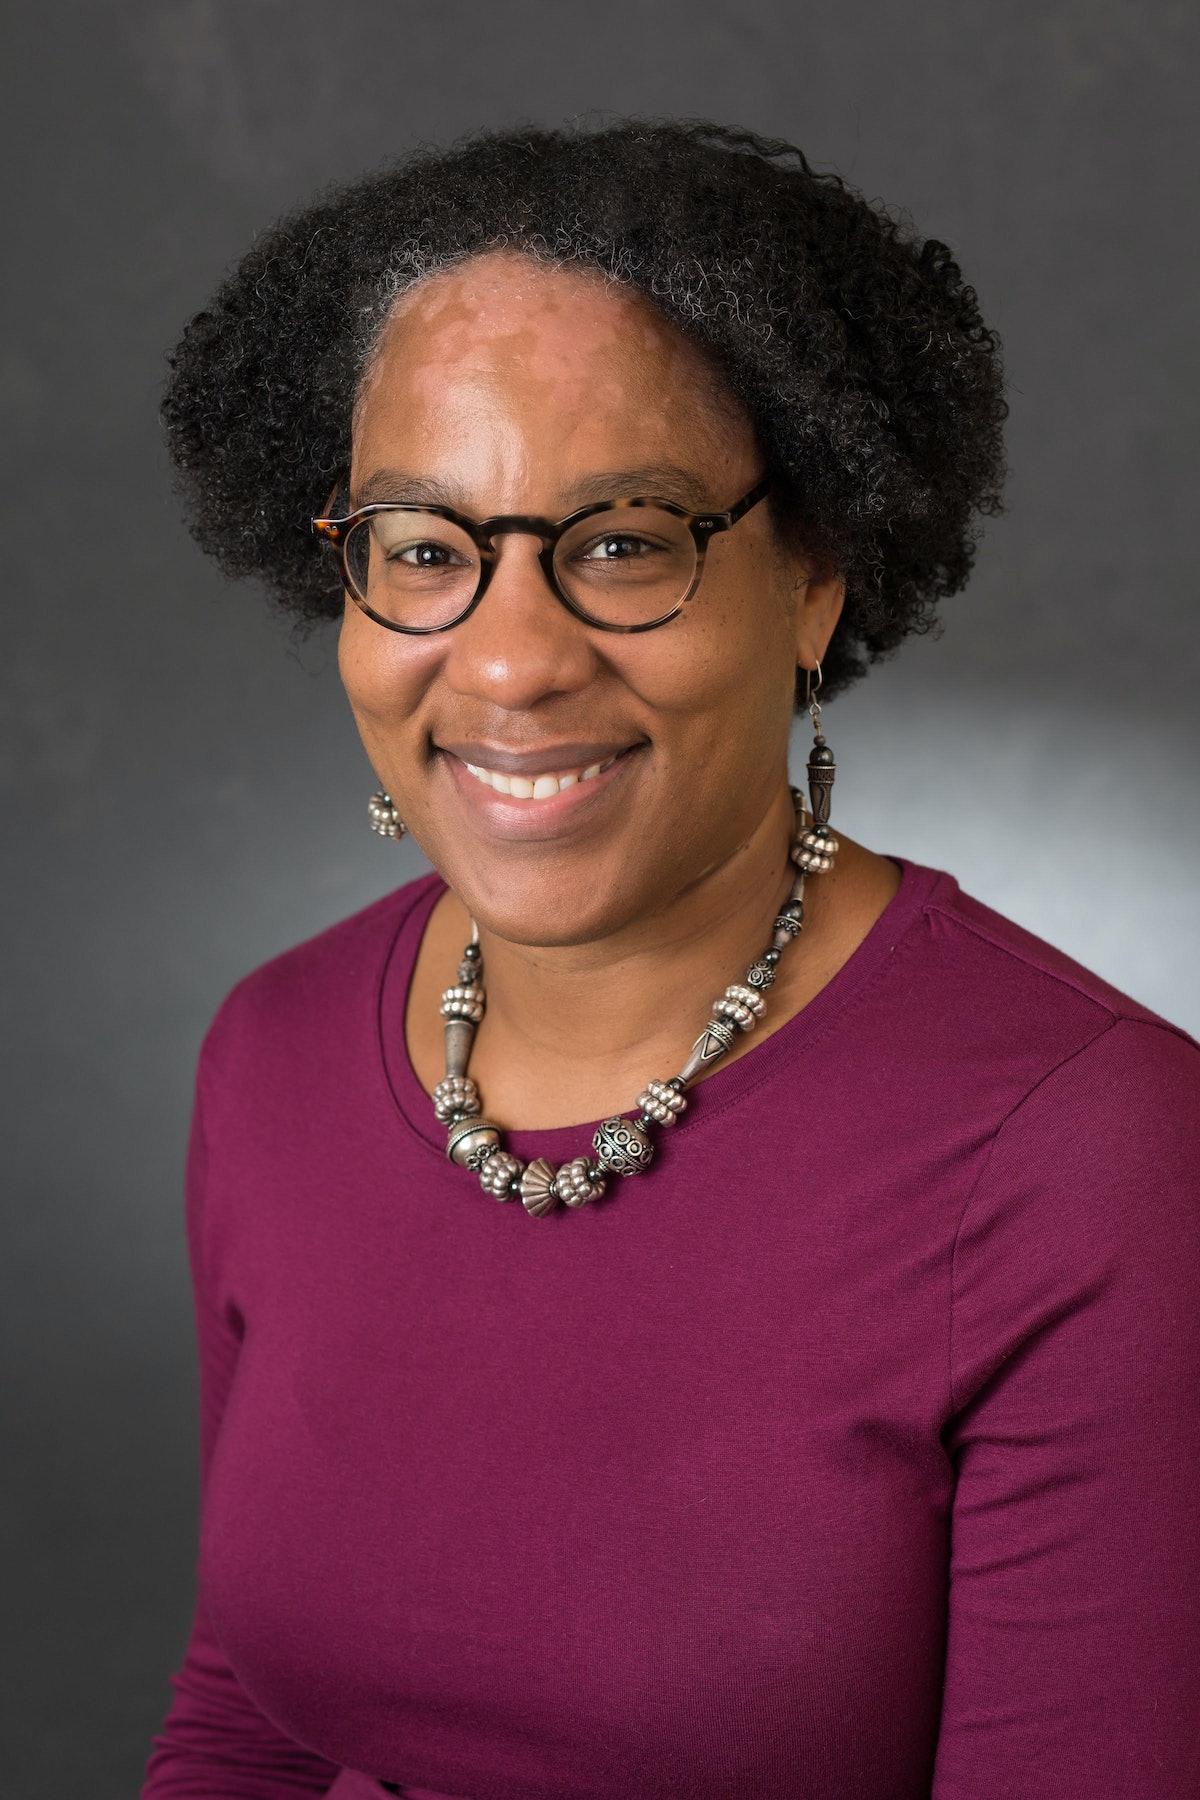 Dr. Monica R. McLemore